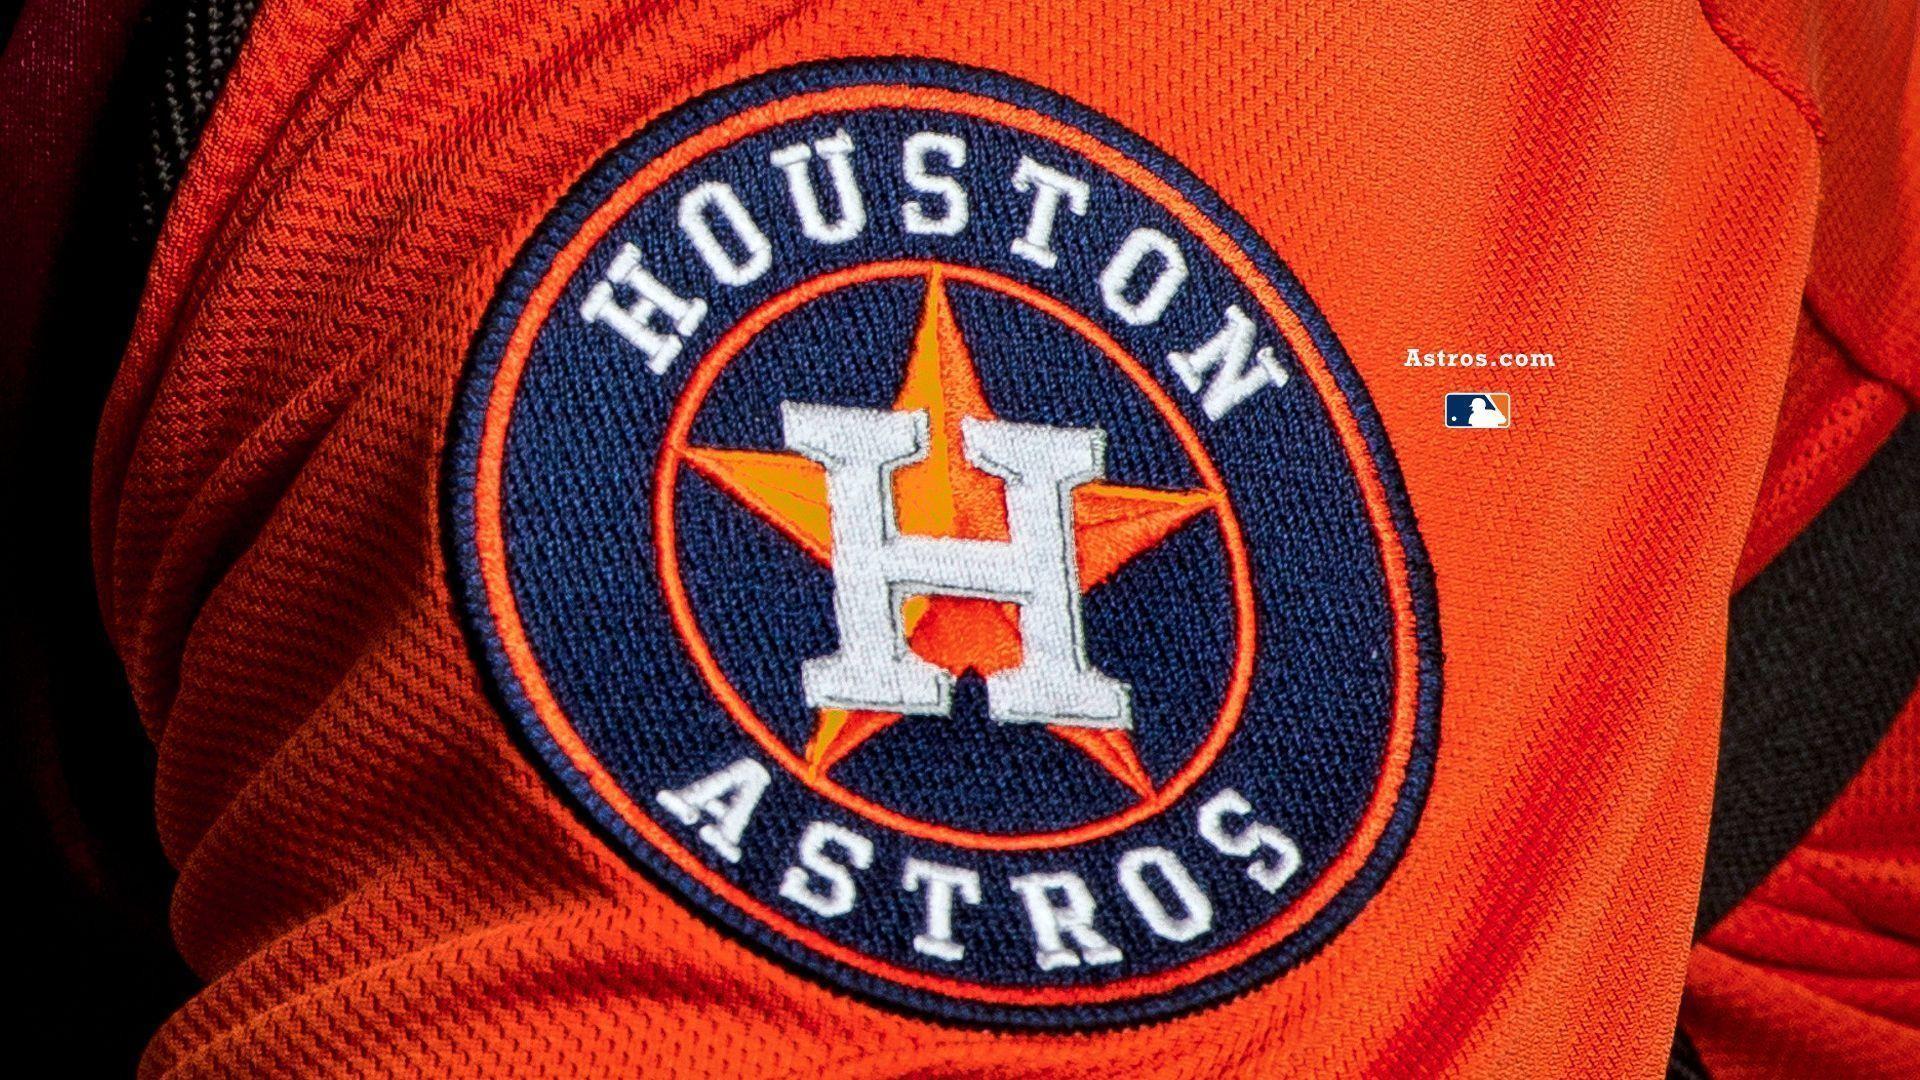 Houston Astros Desktop Wallpaper – WallpaperSafari